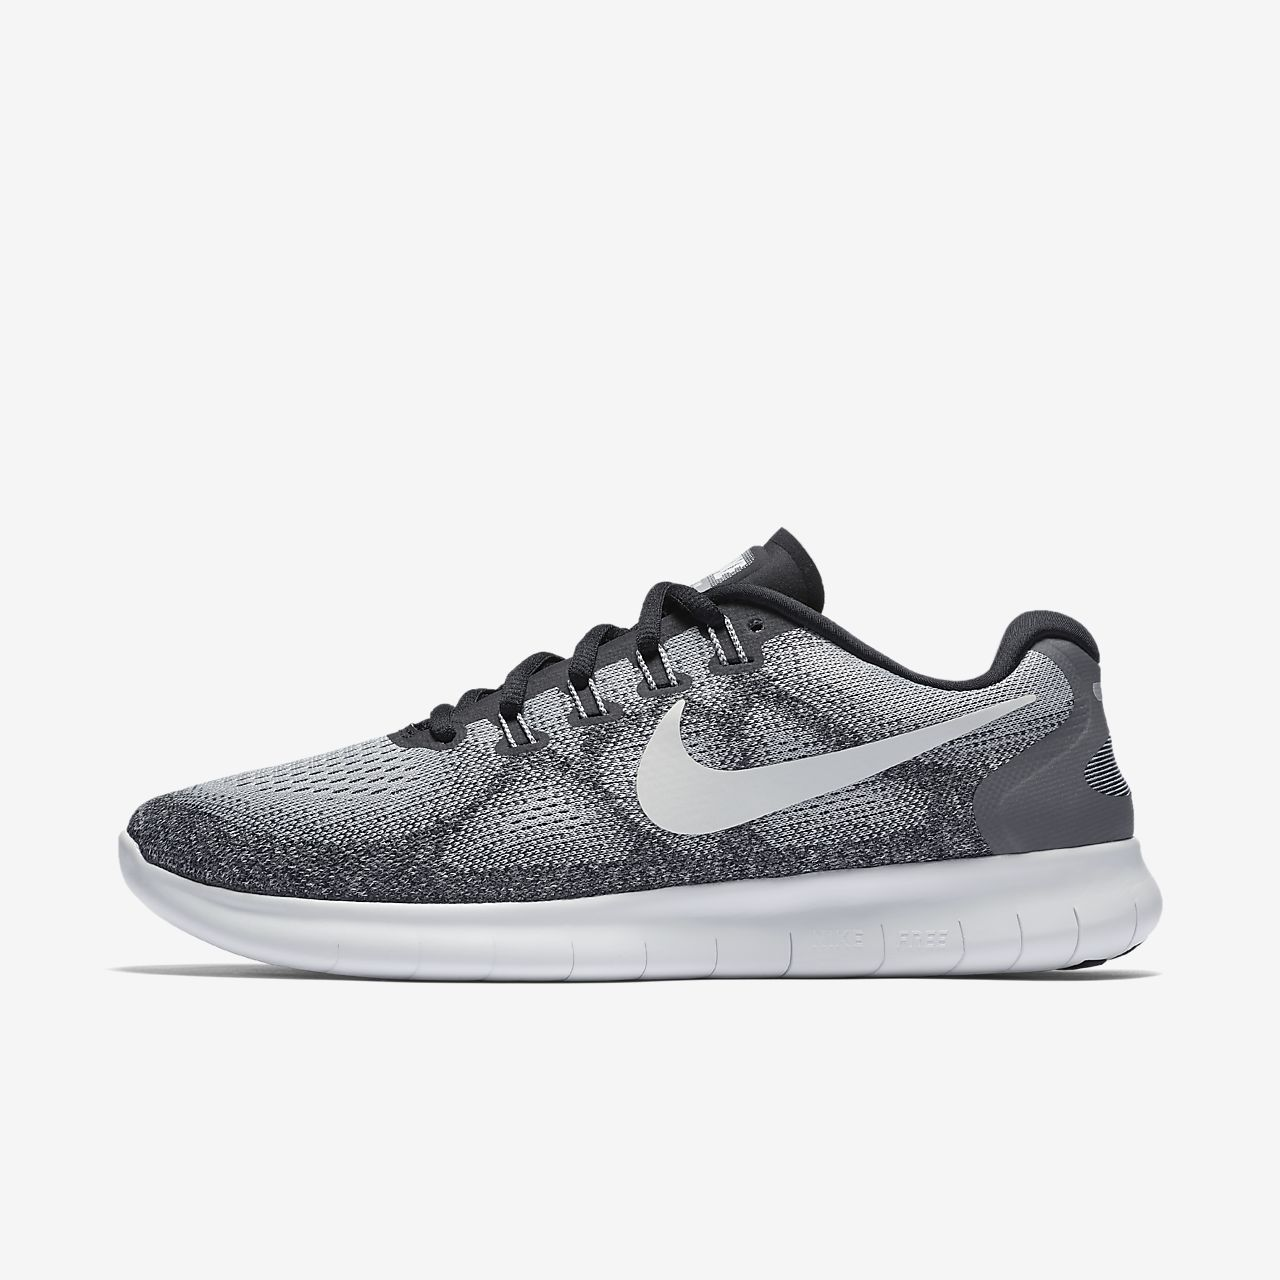 Nike Free Chemise Vichy Noir Et Blanc 2.0 Hommes